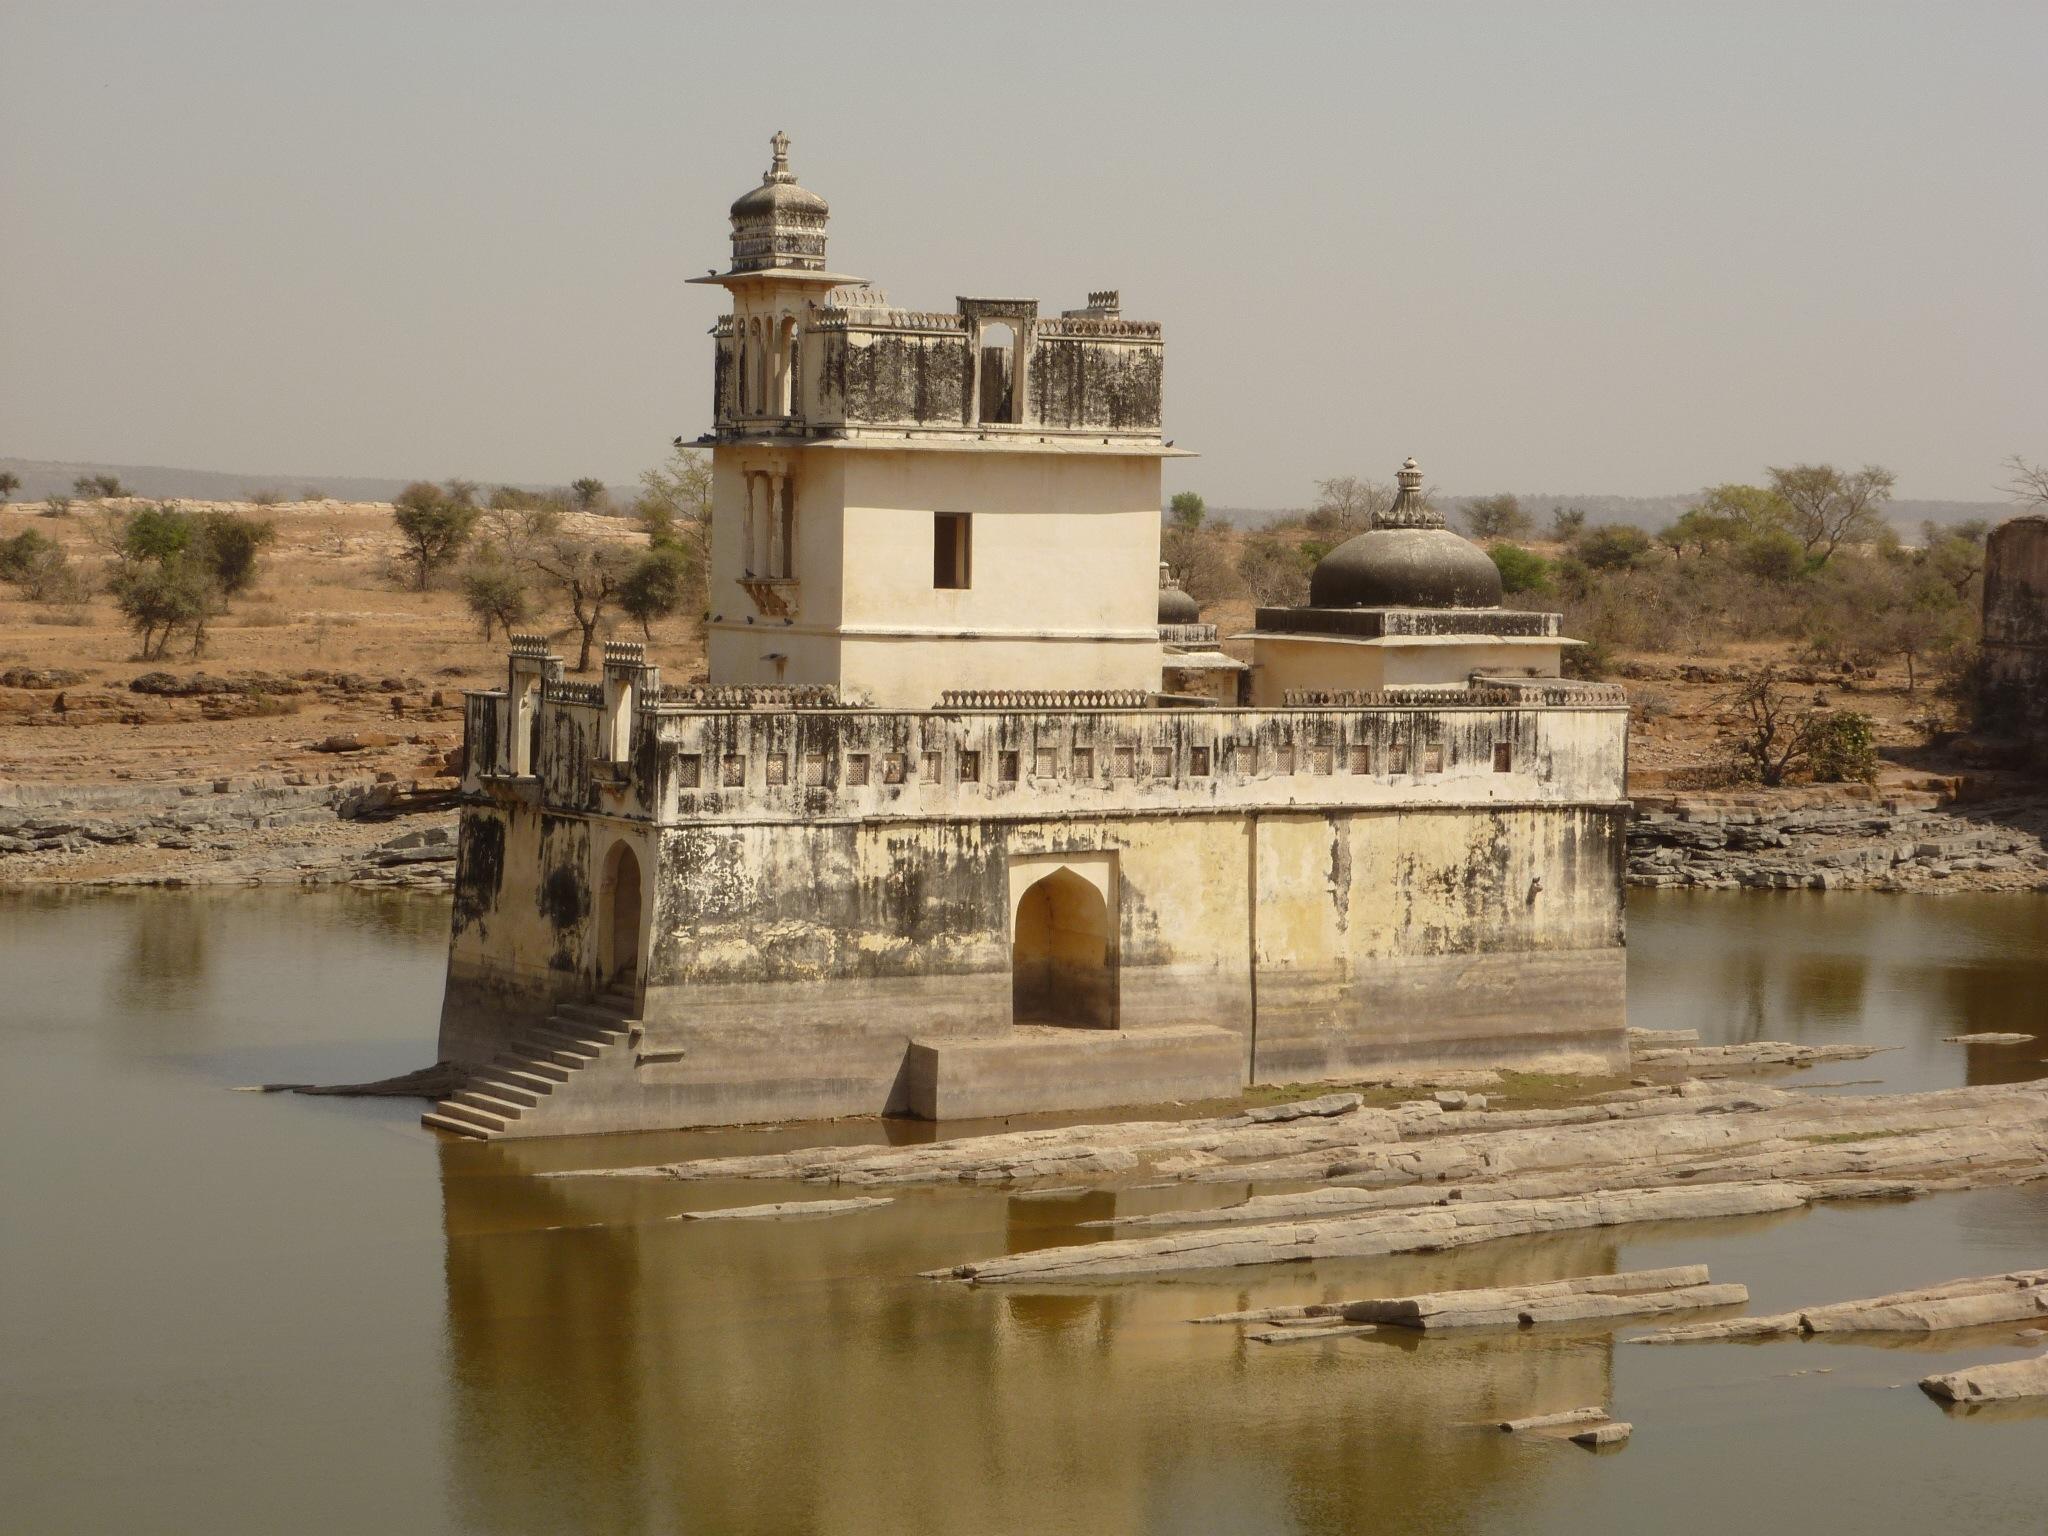 padmini_palace_chittorgarh_rajasthan